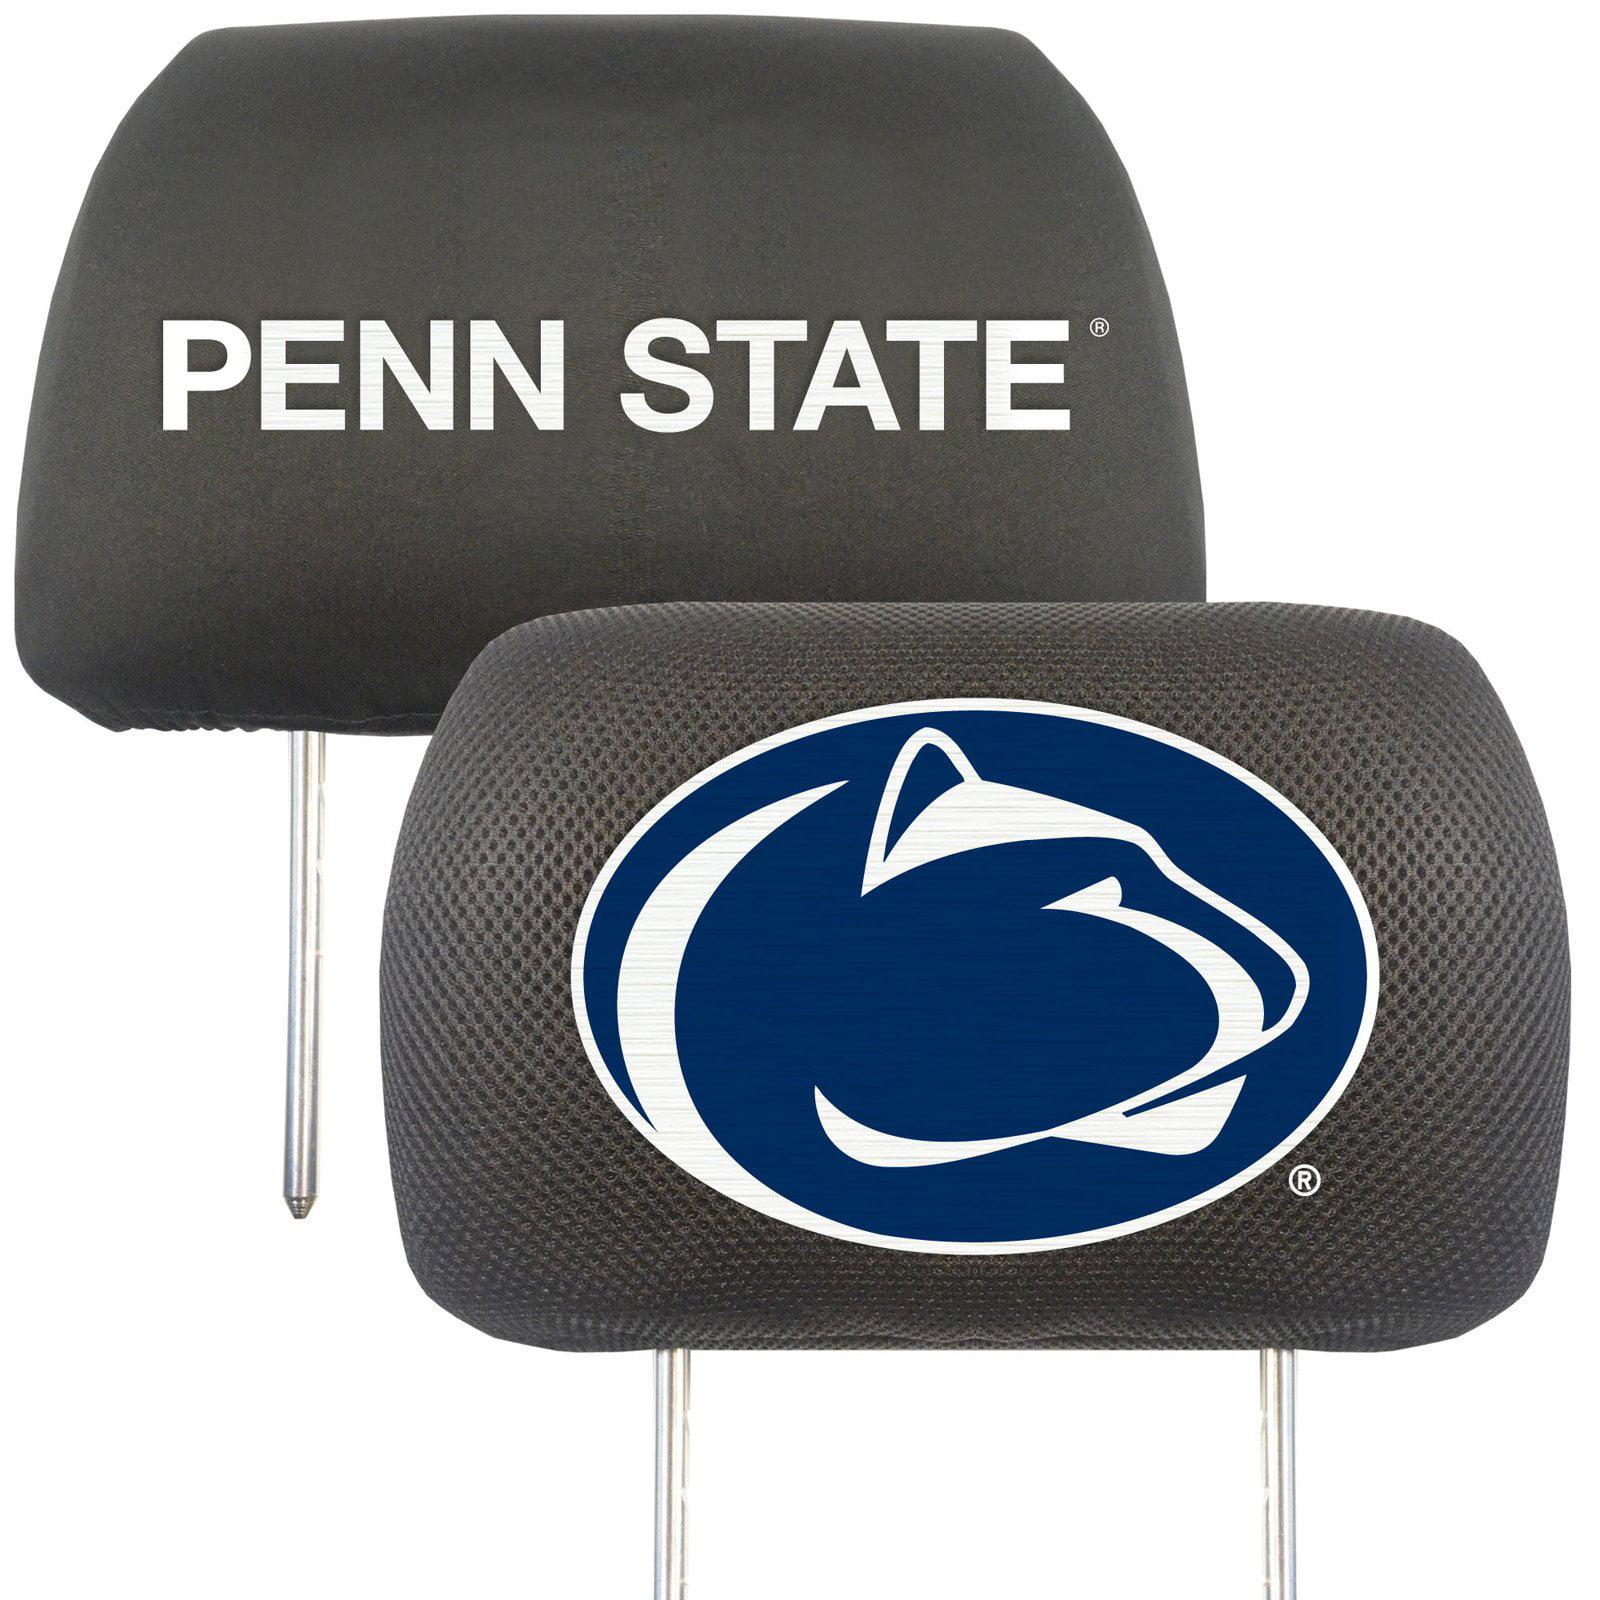 Penn State Headrest Covers